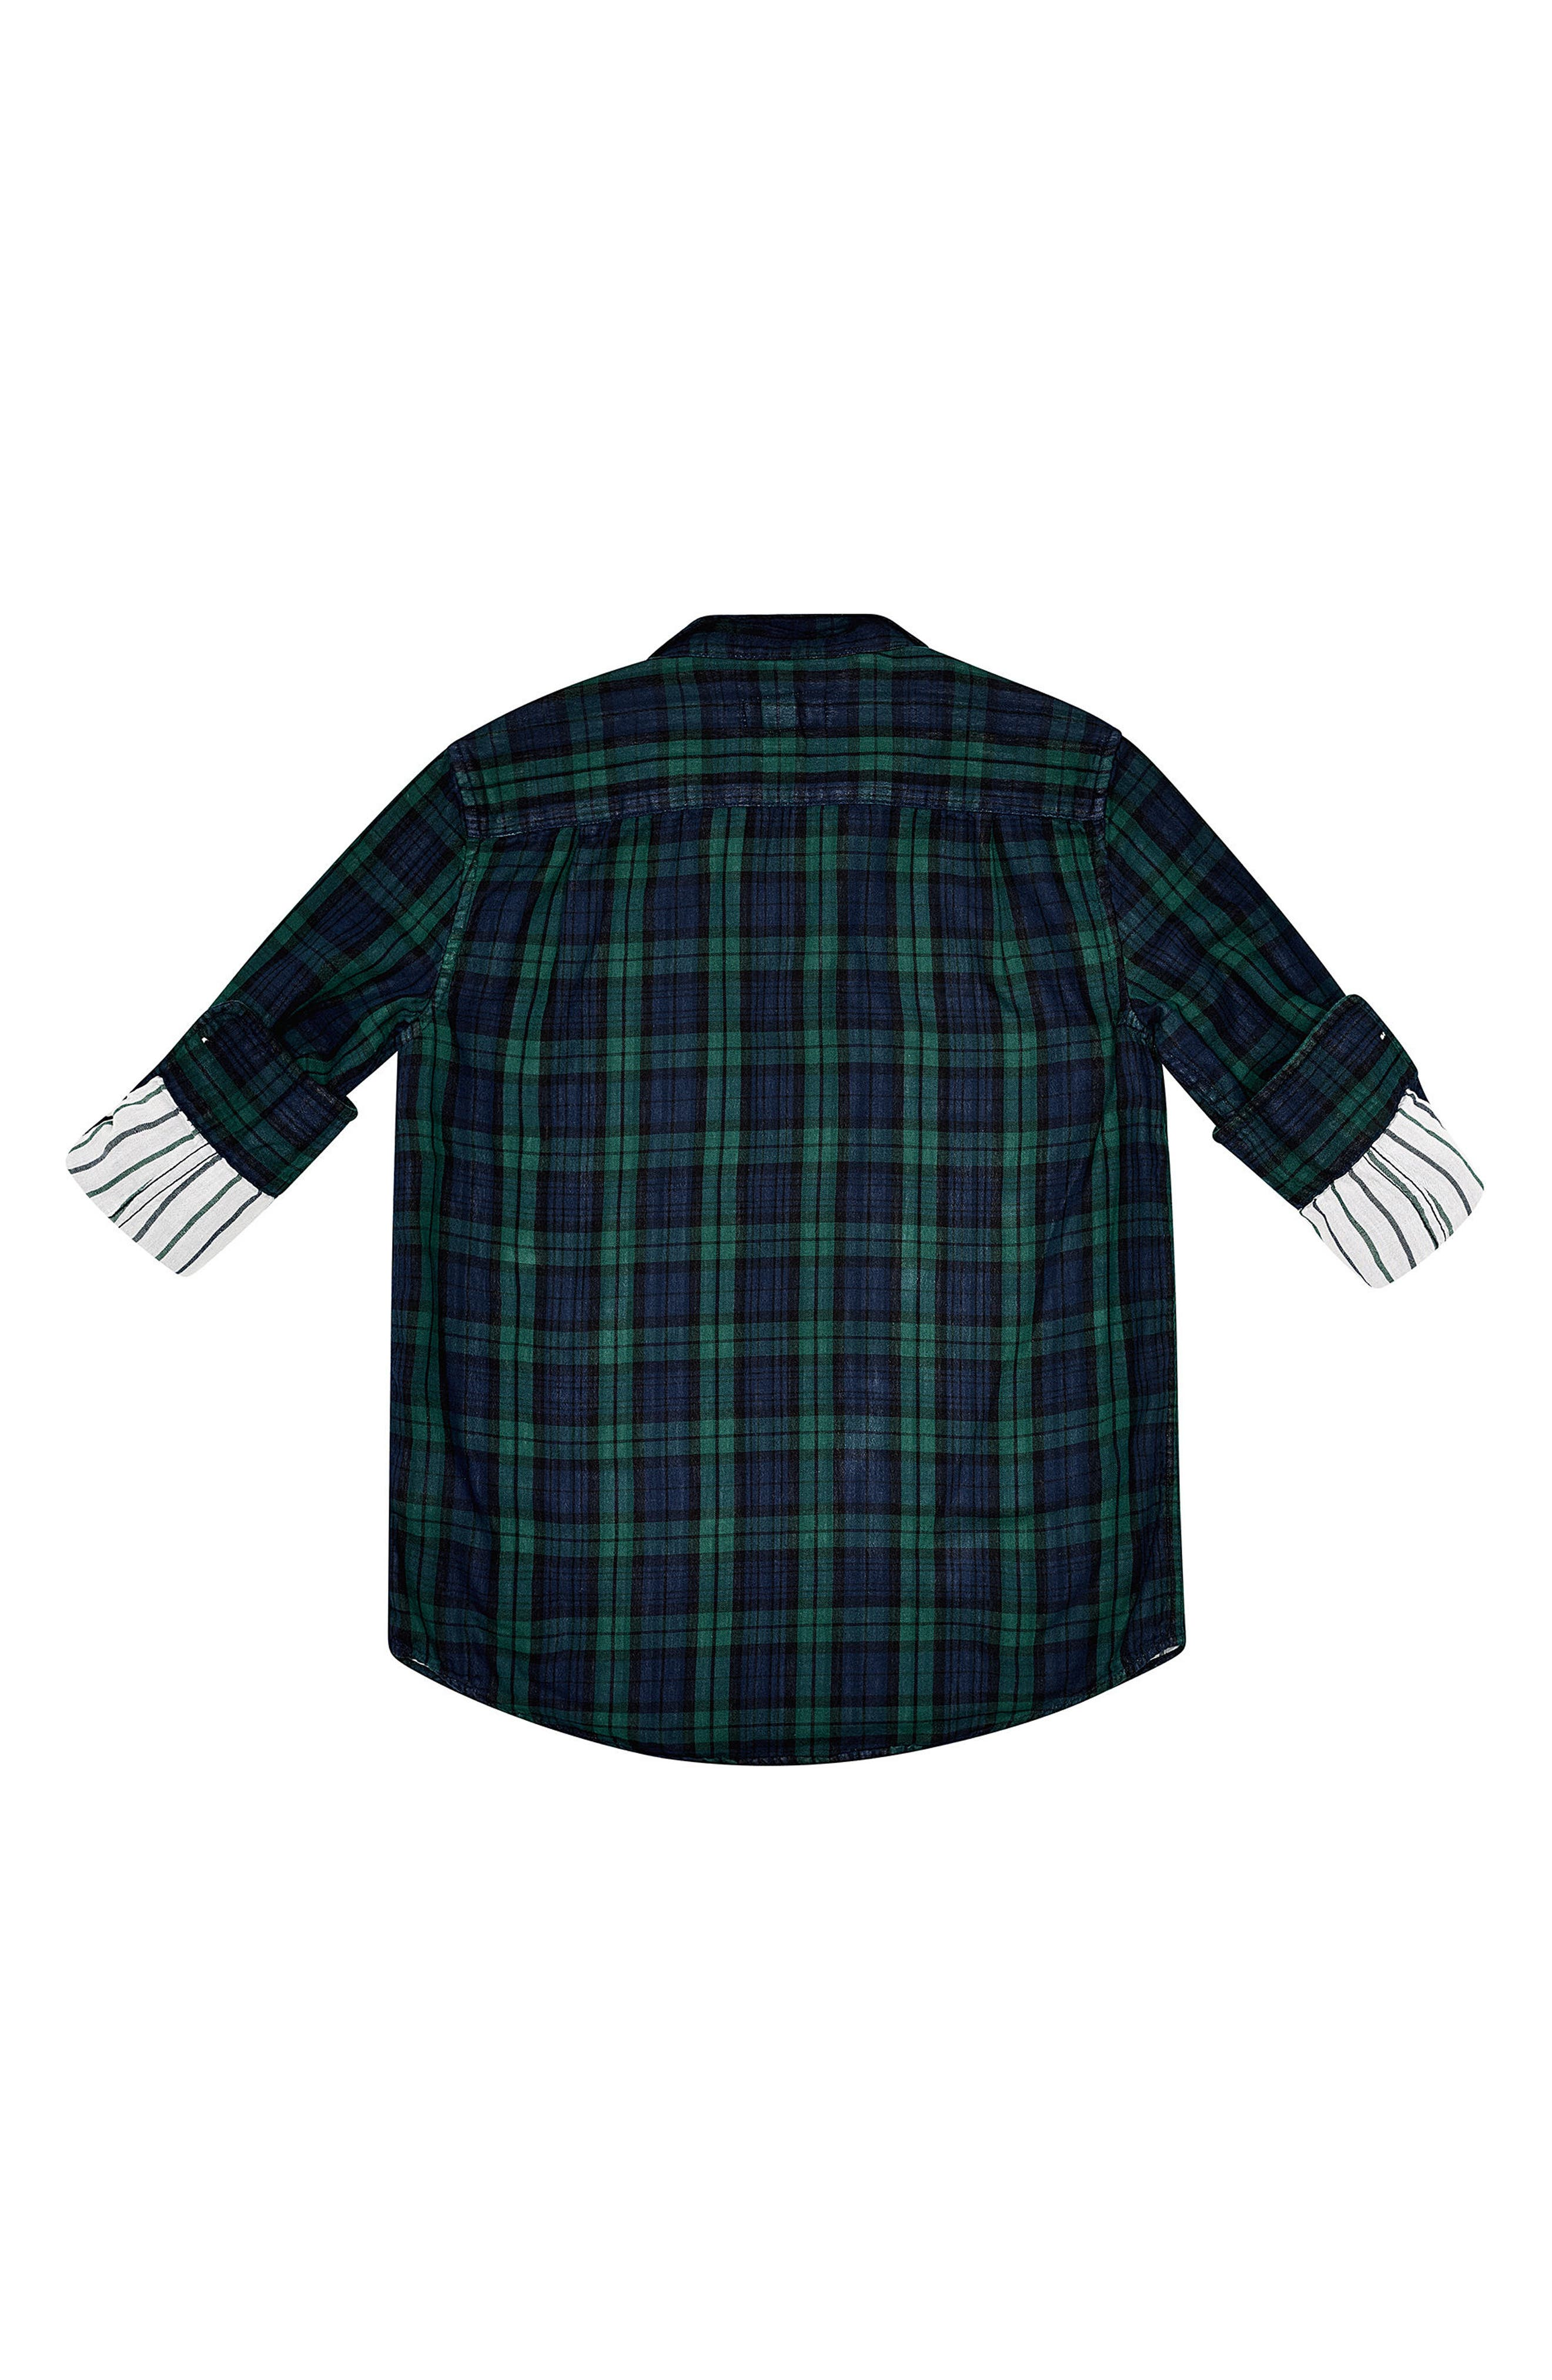 Plaid Woven Shirt,                             Alternate thumbnail 2, color,                             Green Double Faced Plaid